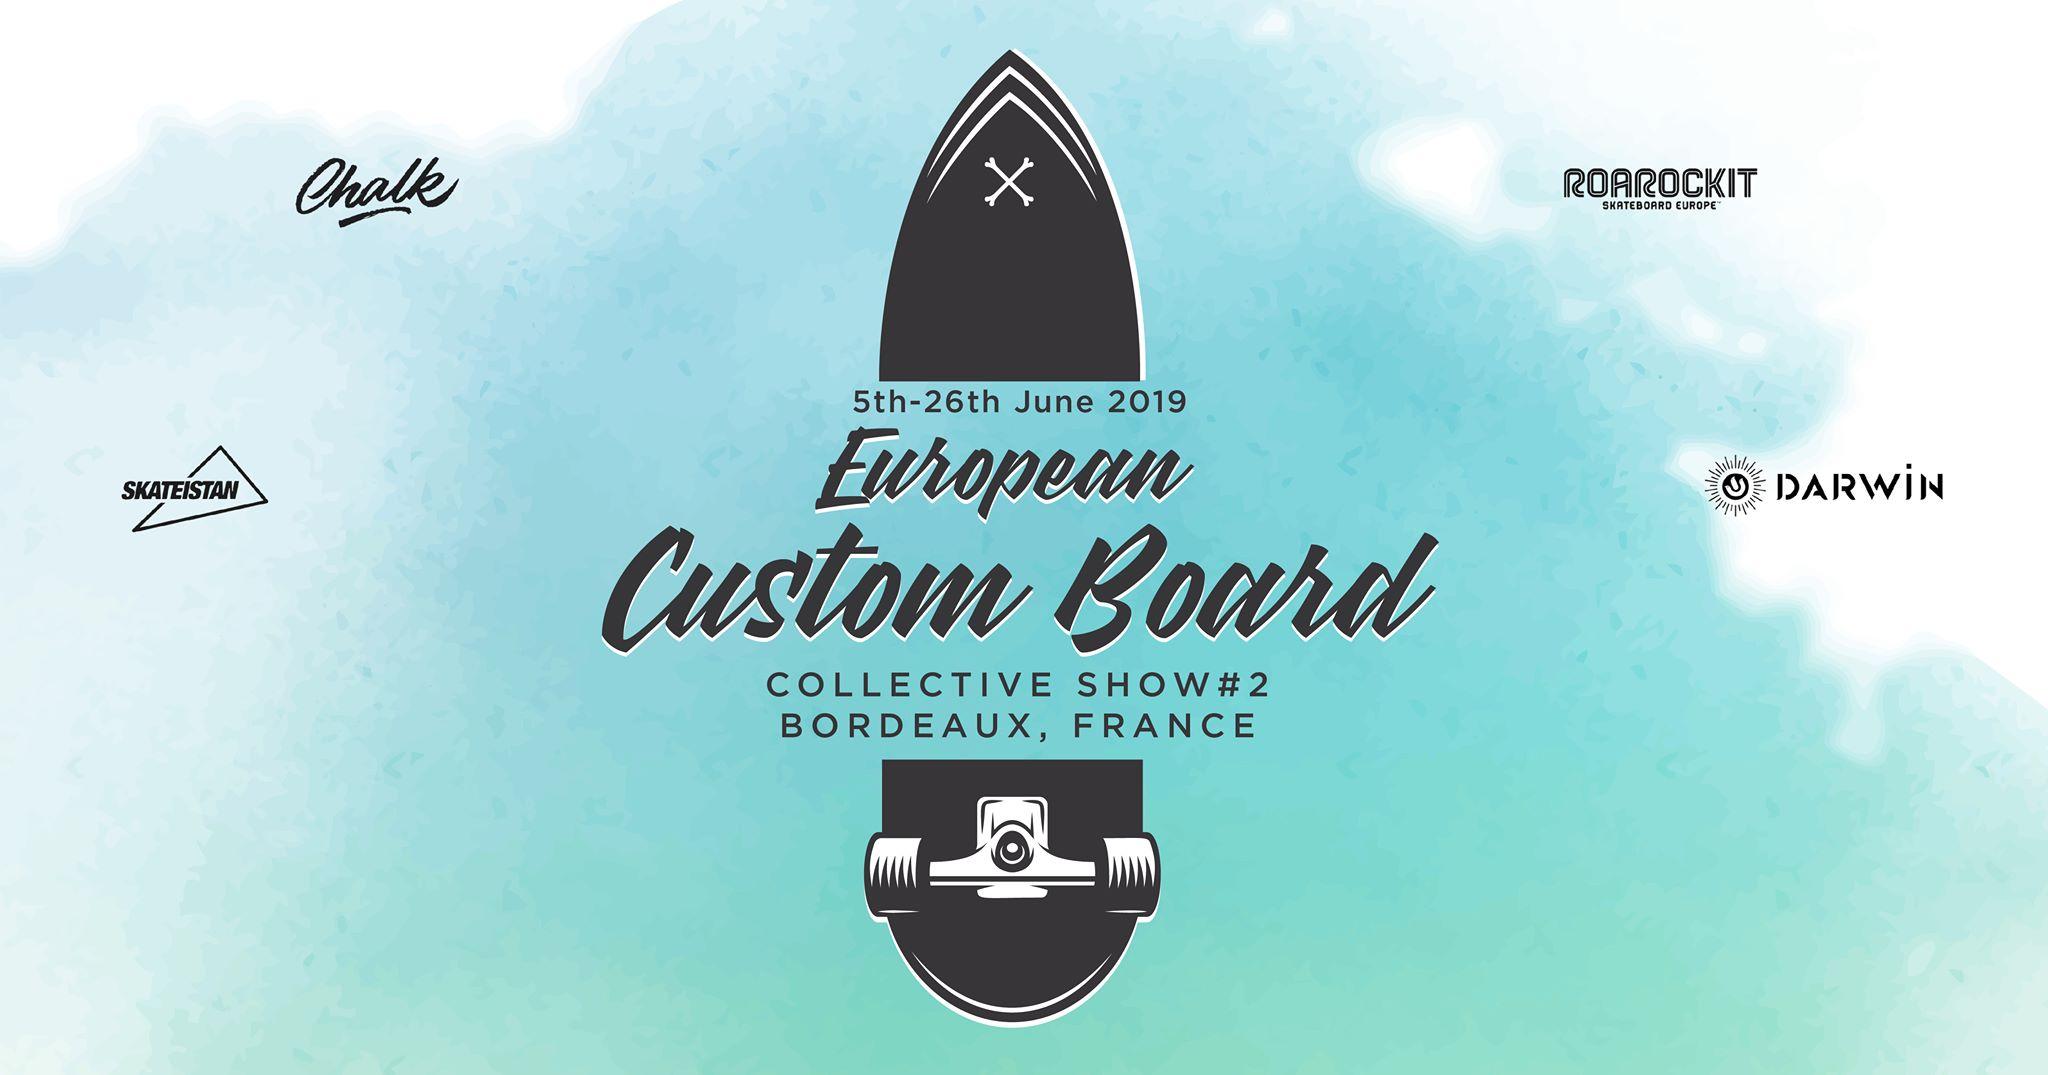 EUROPEAN CUSTOM BOARD COLLECTIVE SHOW #2